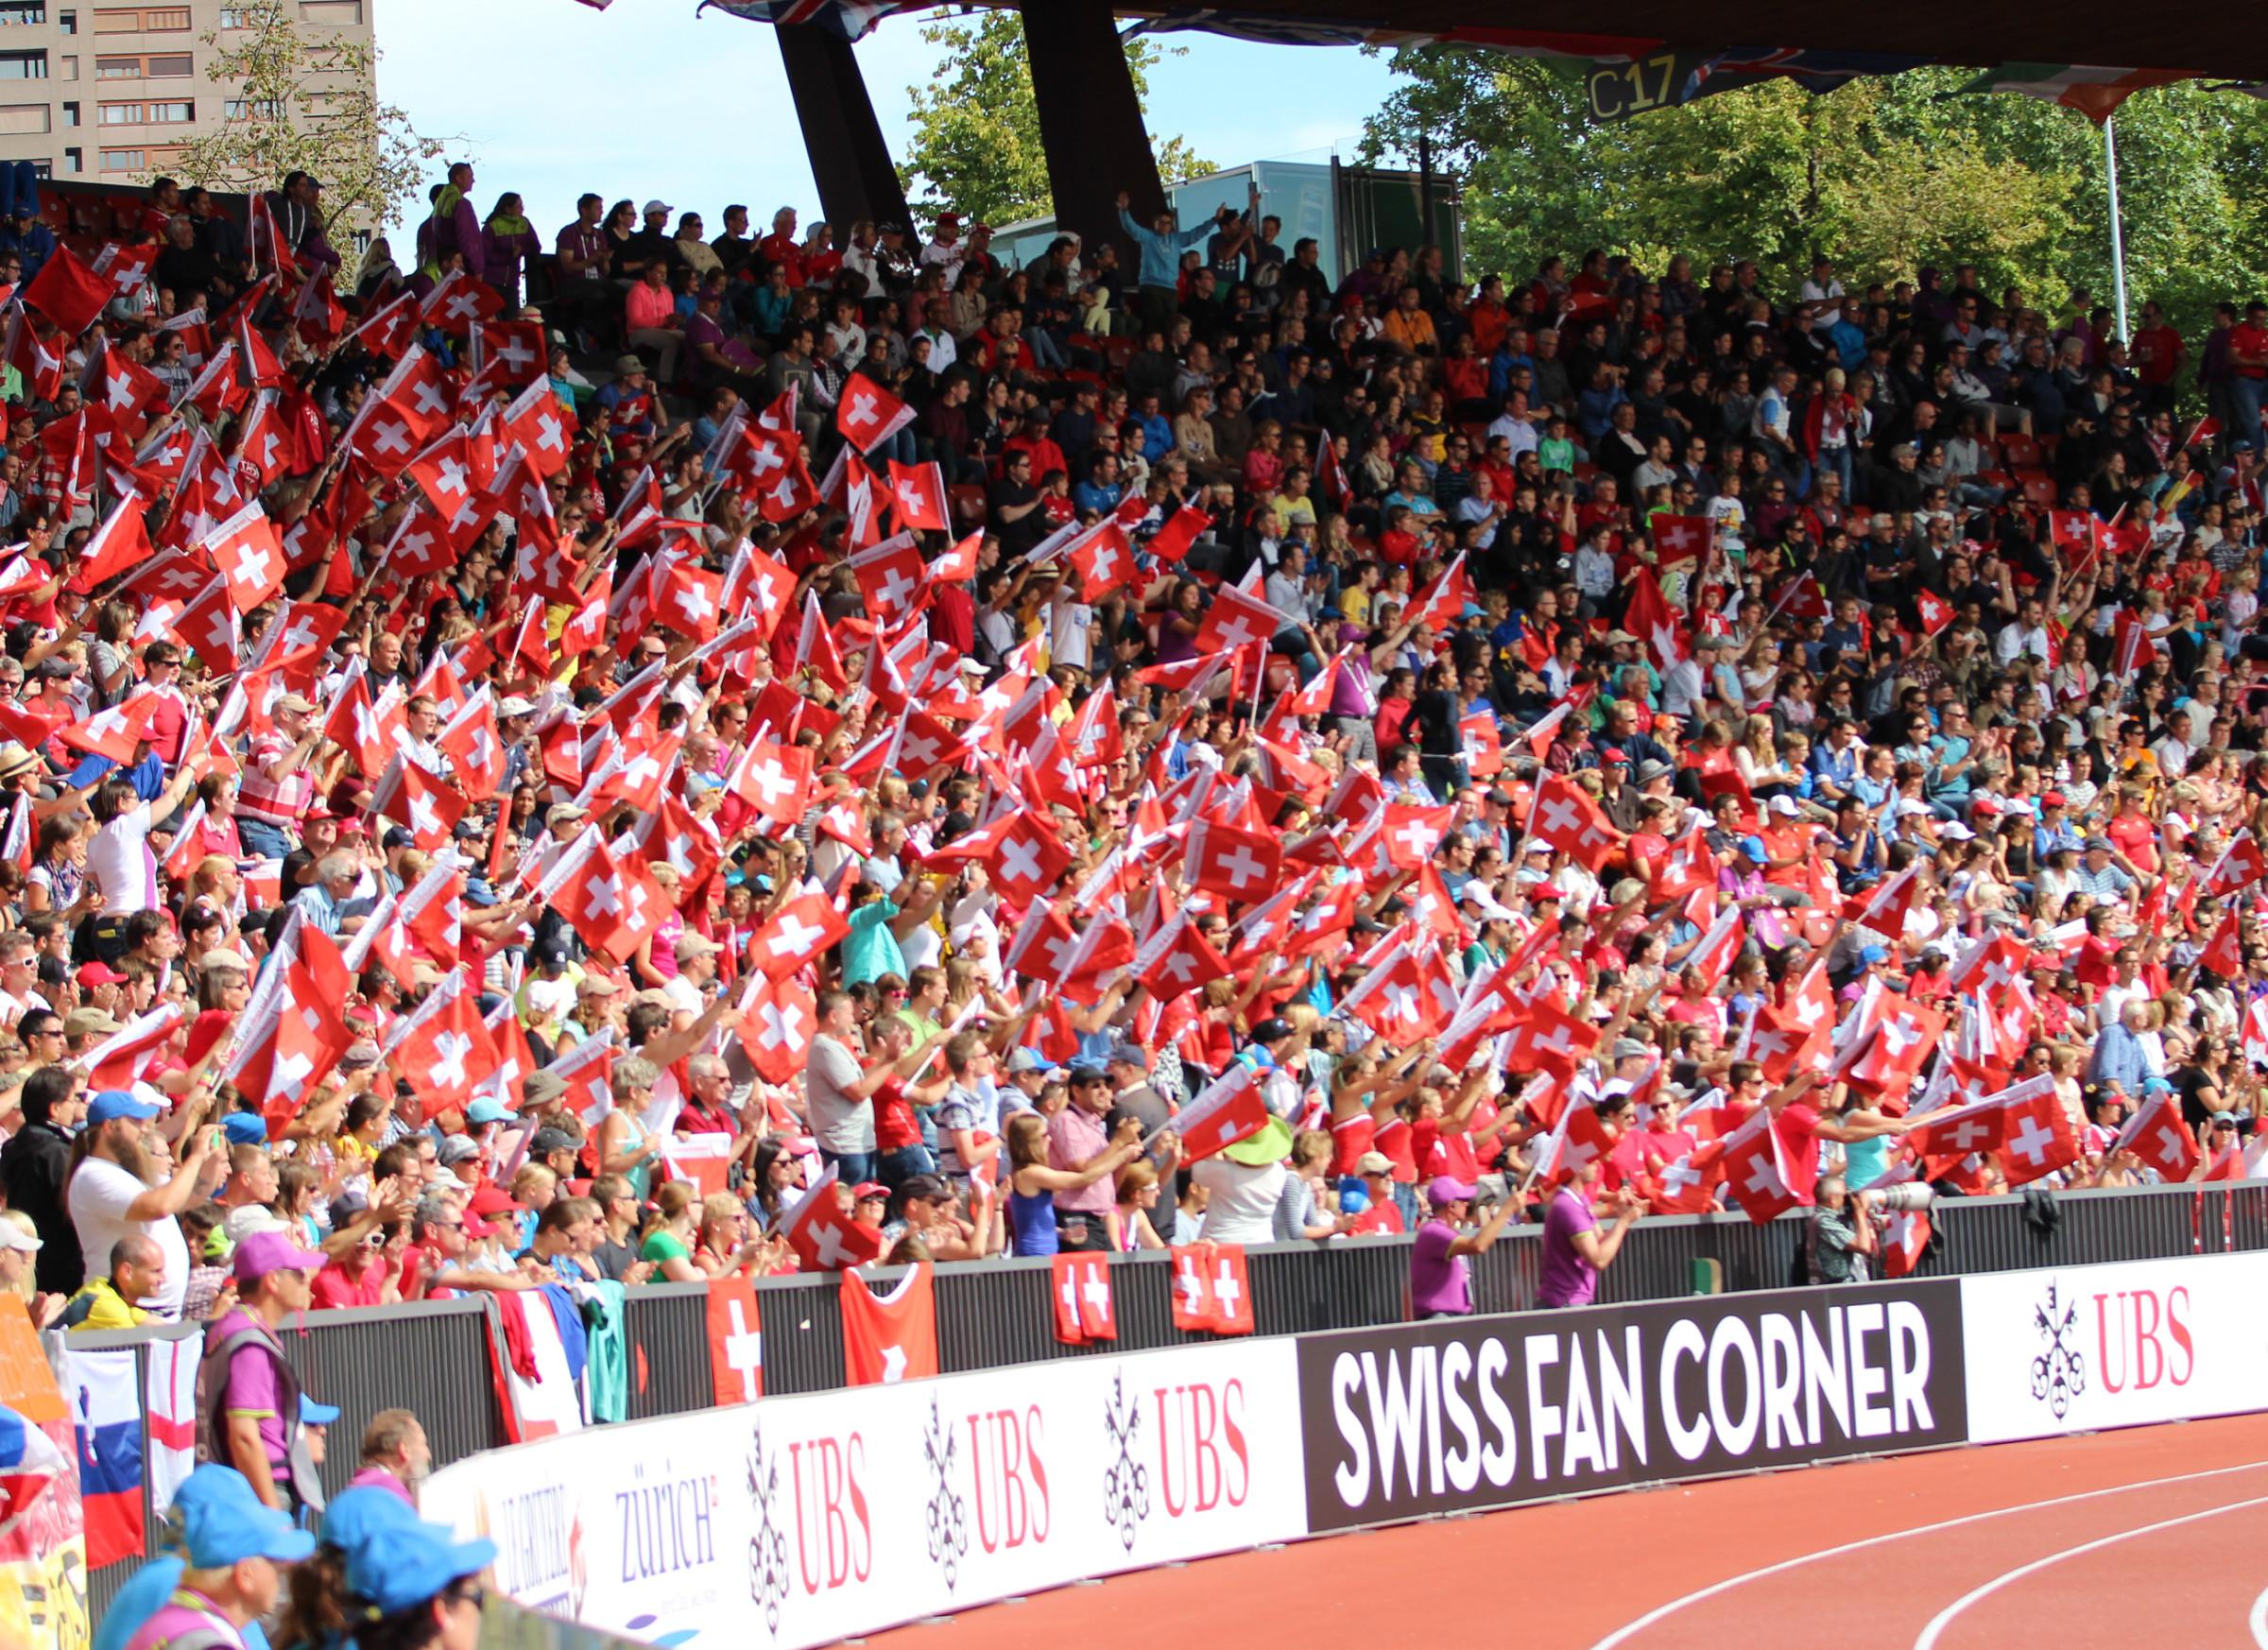 Leichtathletik-EM 2014, 17. August 2014 (Bild: Hugo Rey)